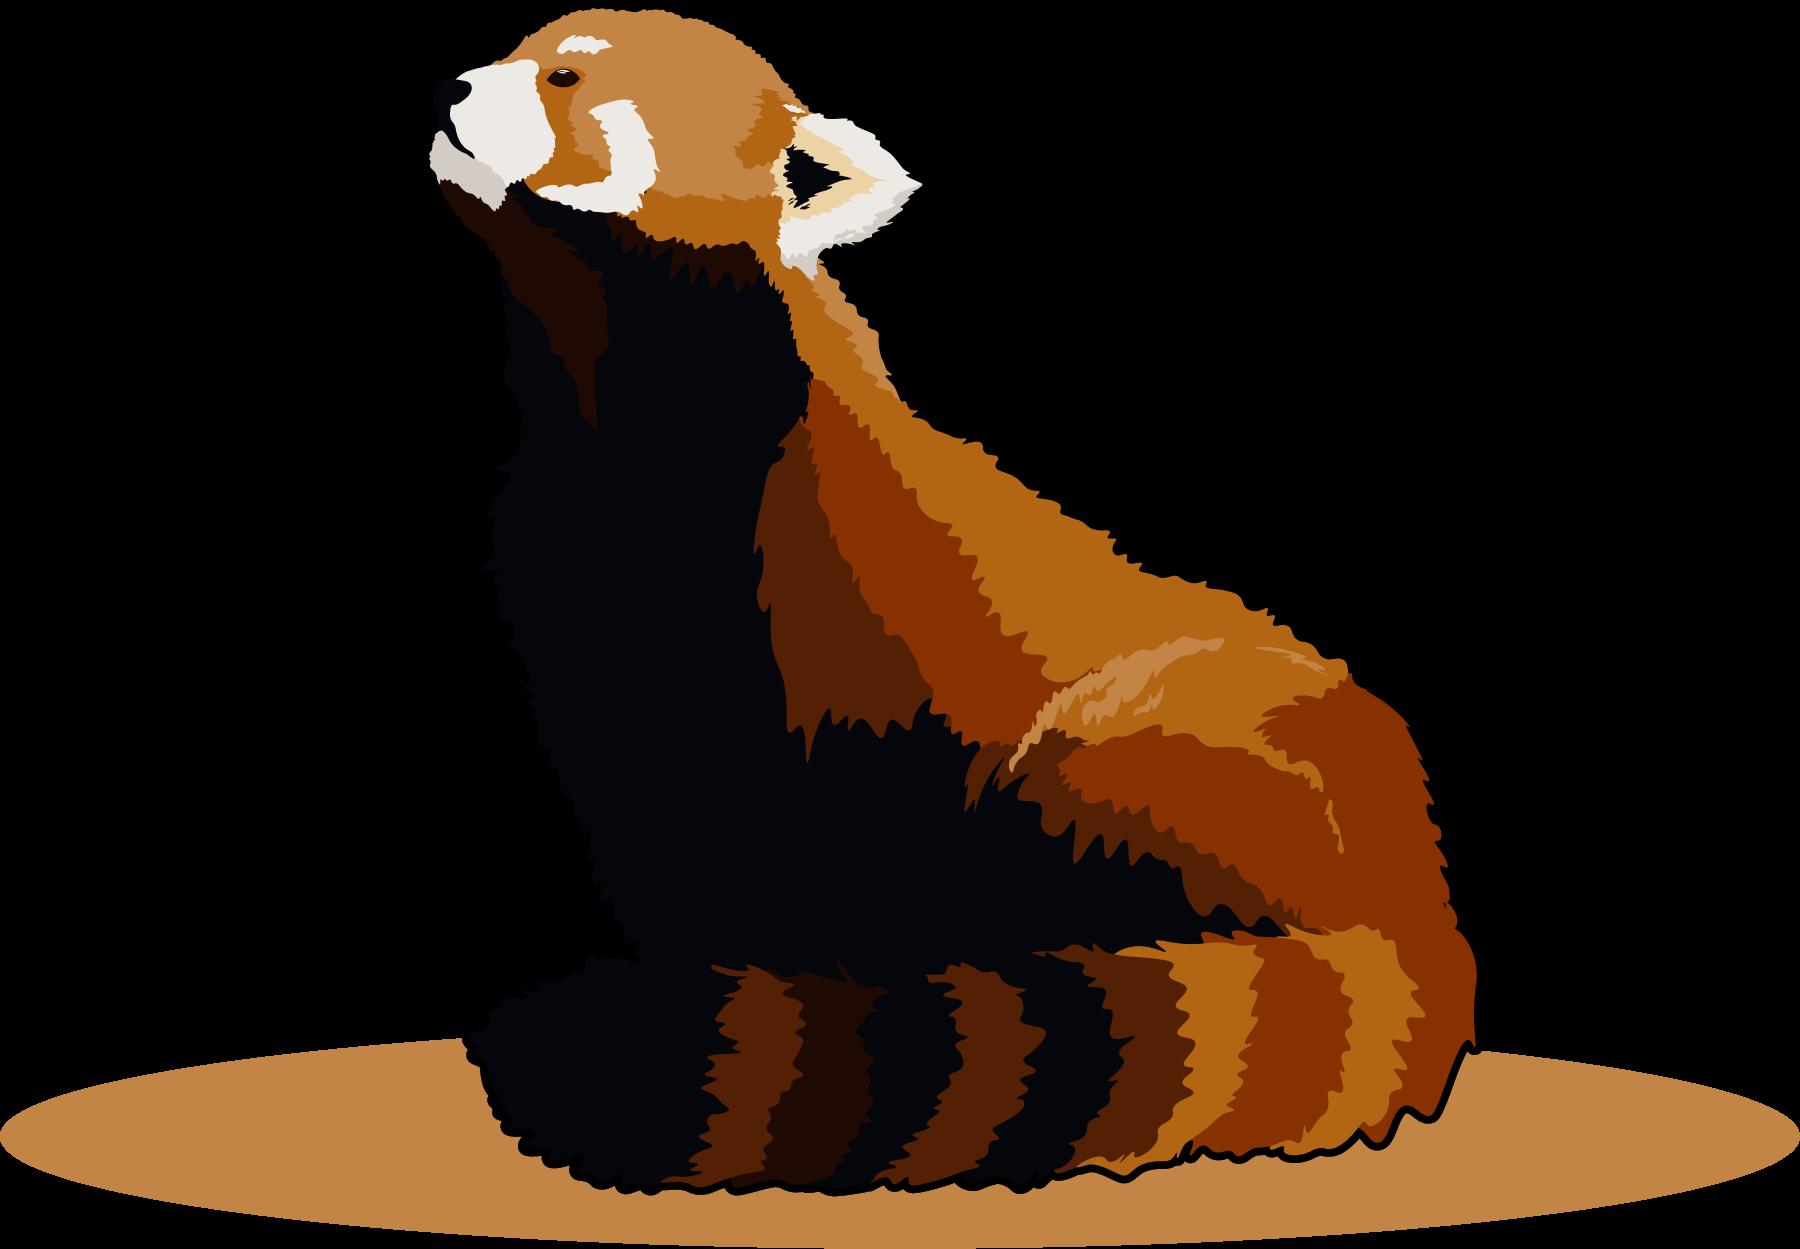 Bhim the Panda, posing for the Freelance Branding Package